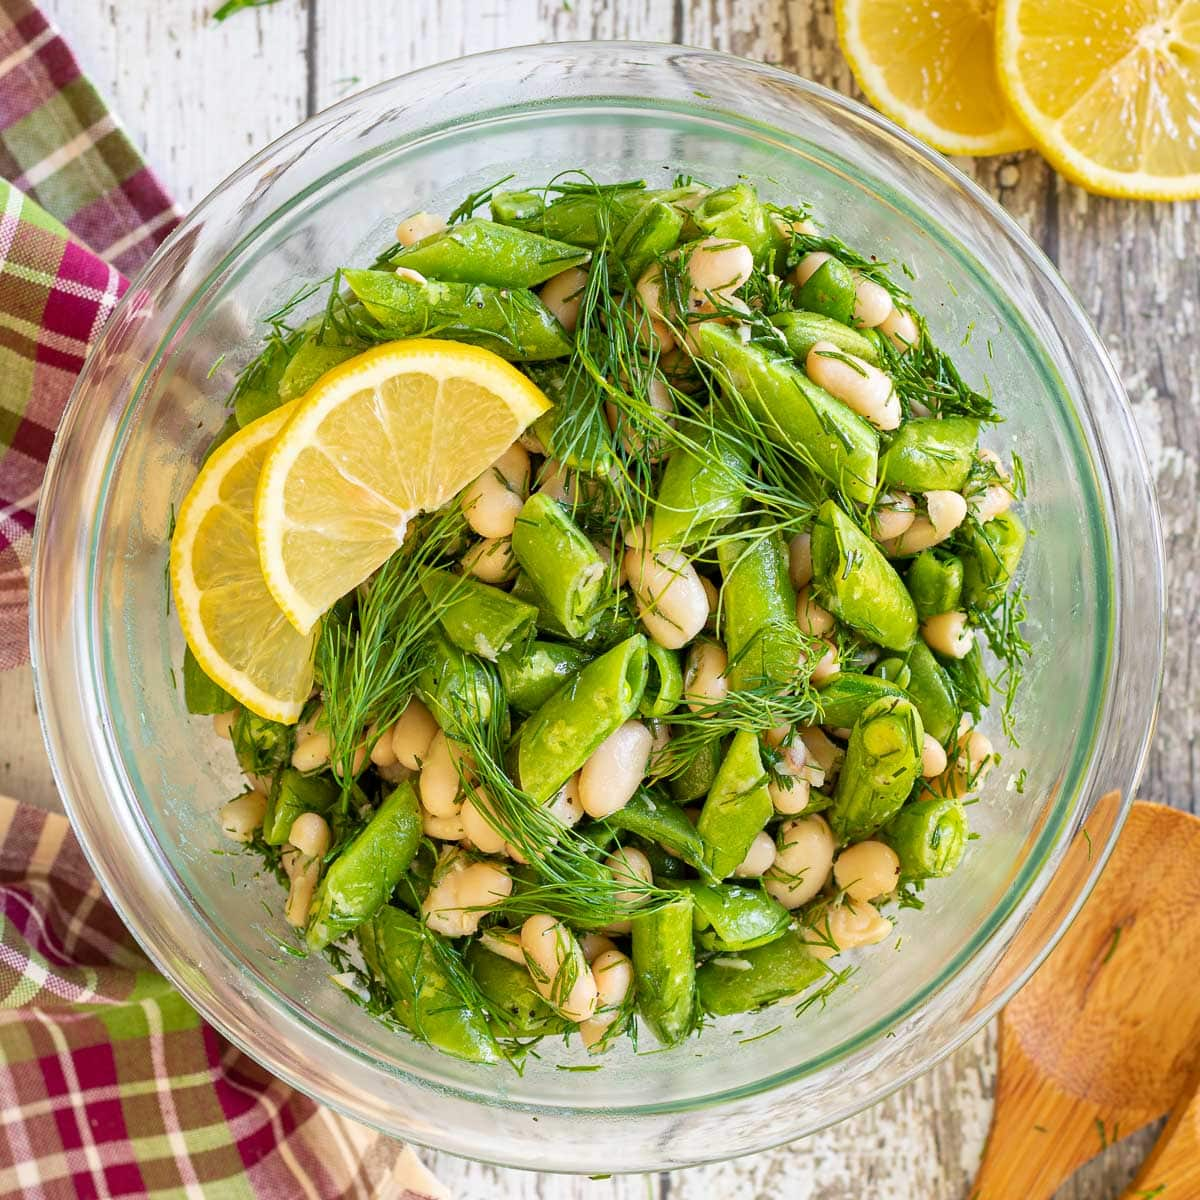 sugar snap pea salad with lemon slice garnish